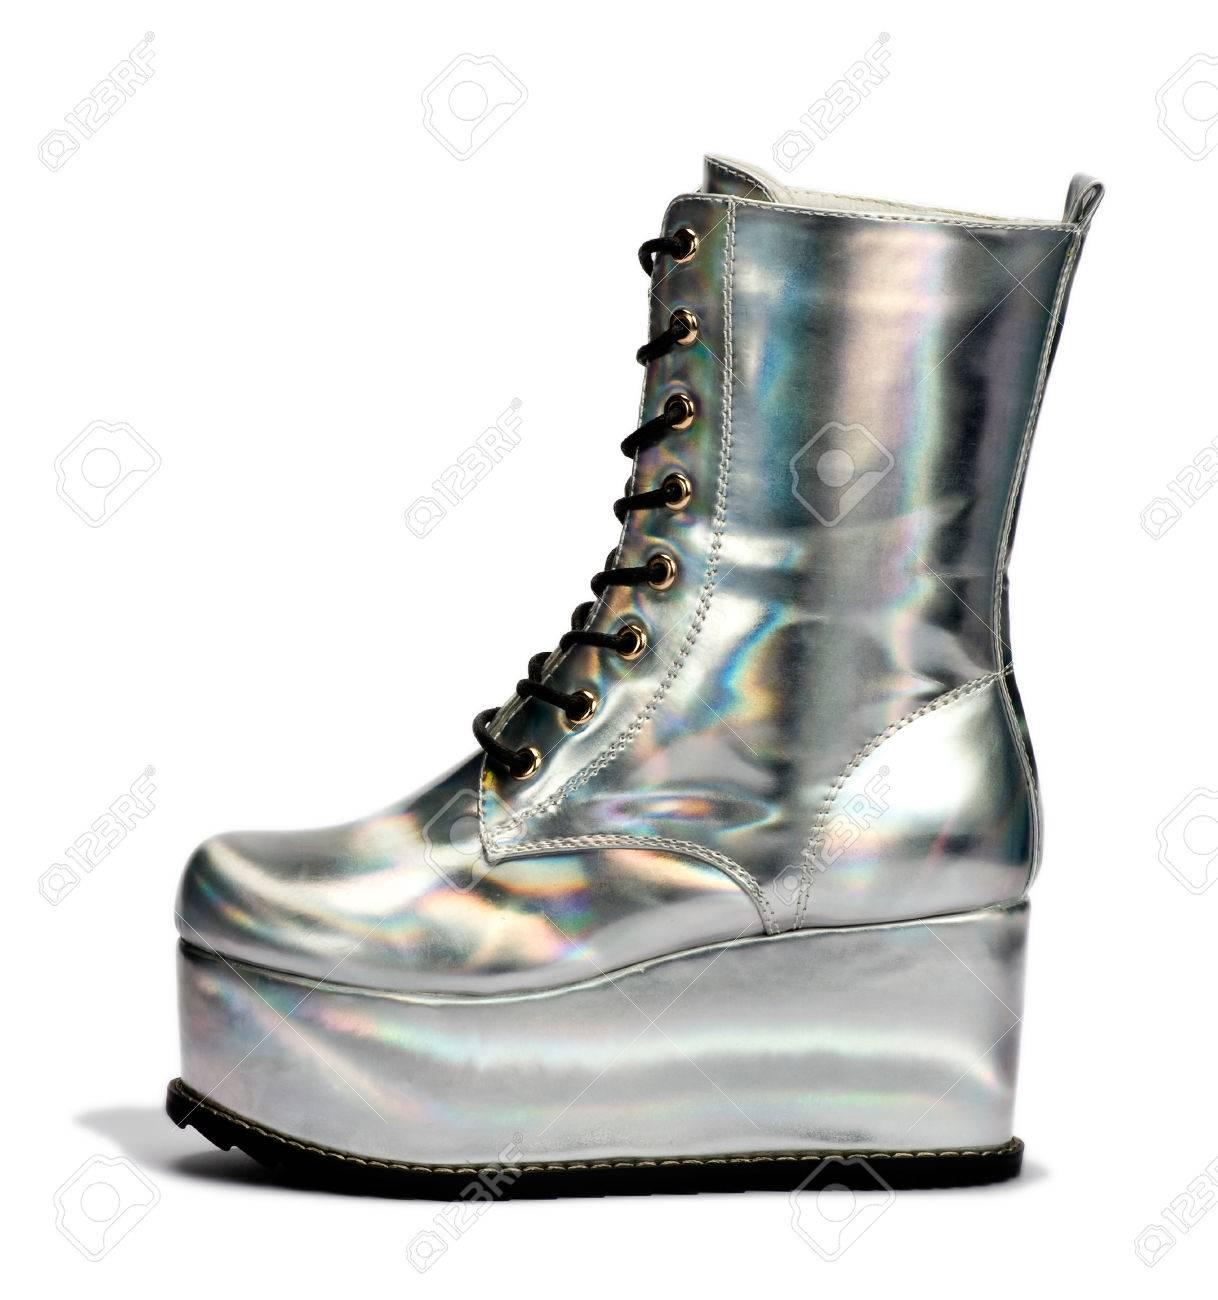 9a1a35c8ffb5 Close Up Elegant Silver Alien High Cut Shoes